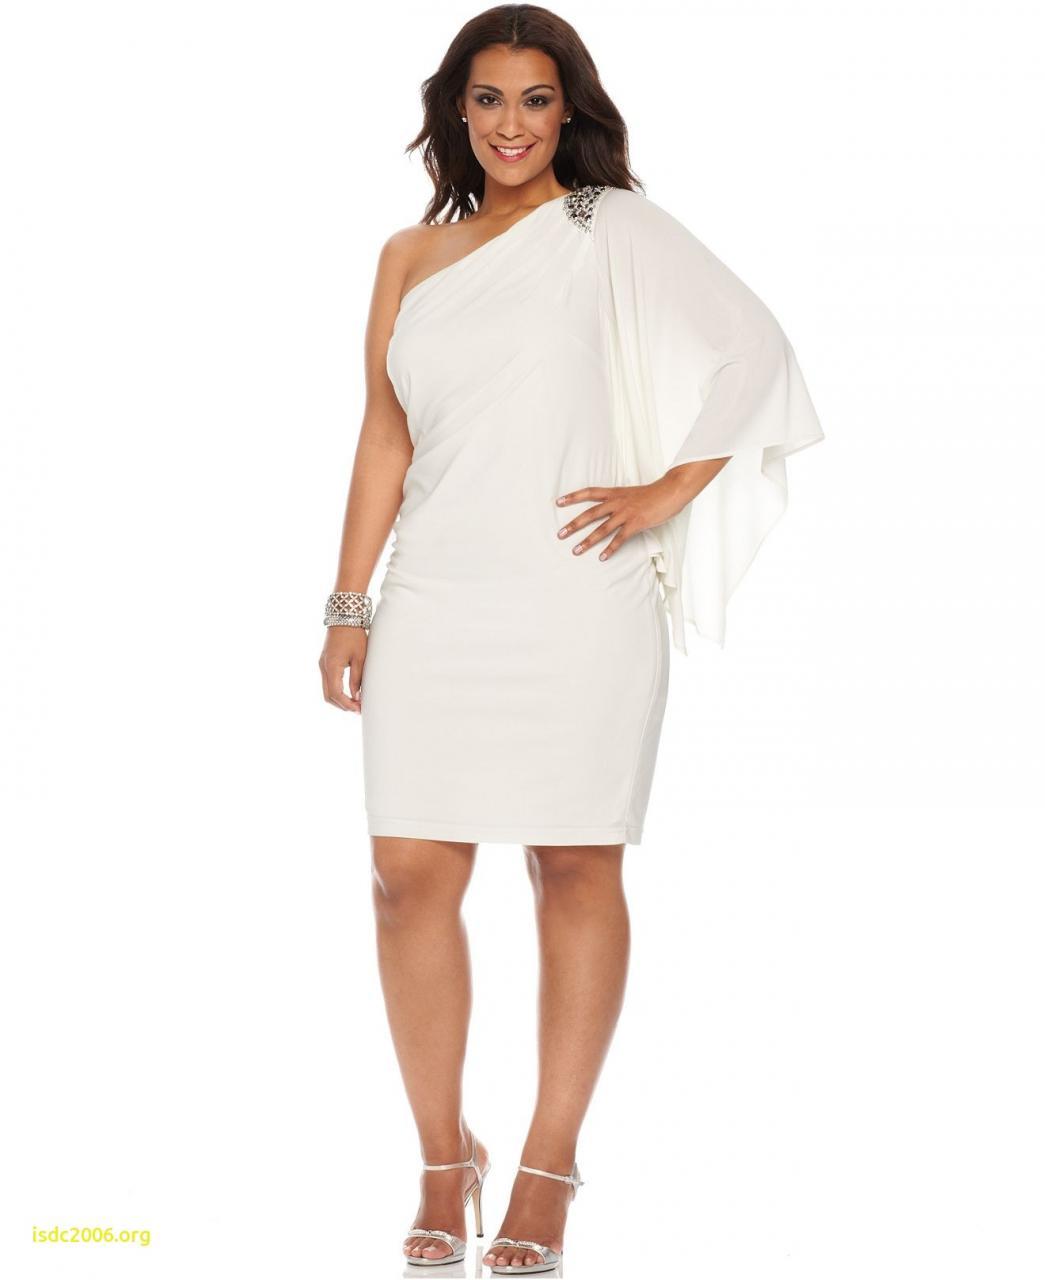 R Richards Plus Size Dress Three Quarter Flutter Sleeve e Shoulder Beaded Cocktail Dress